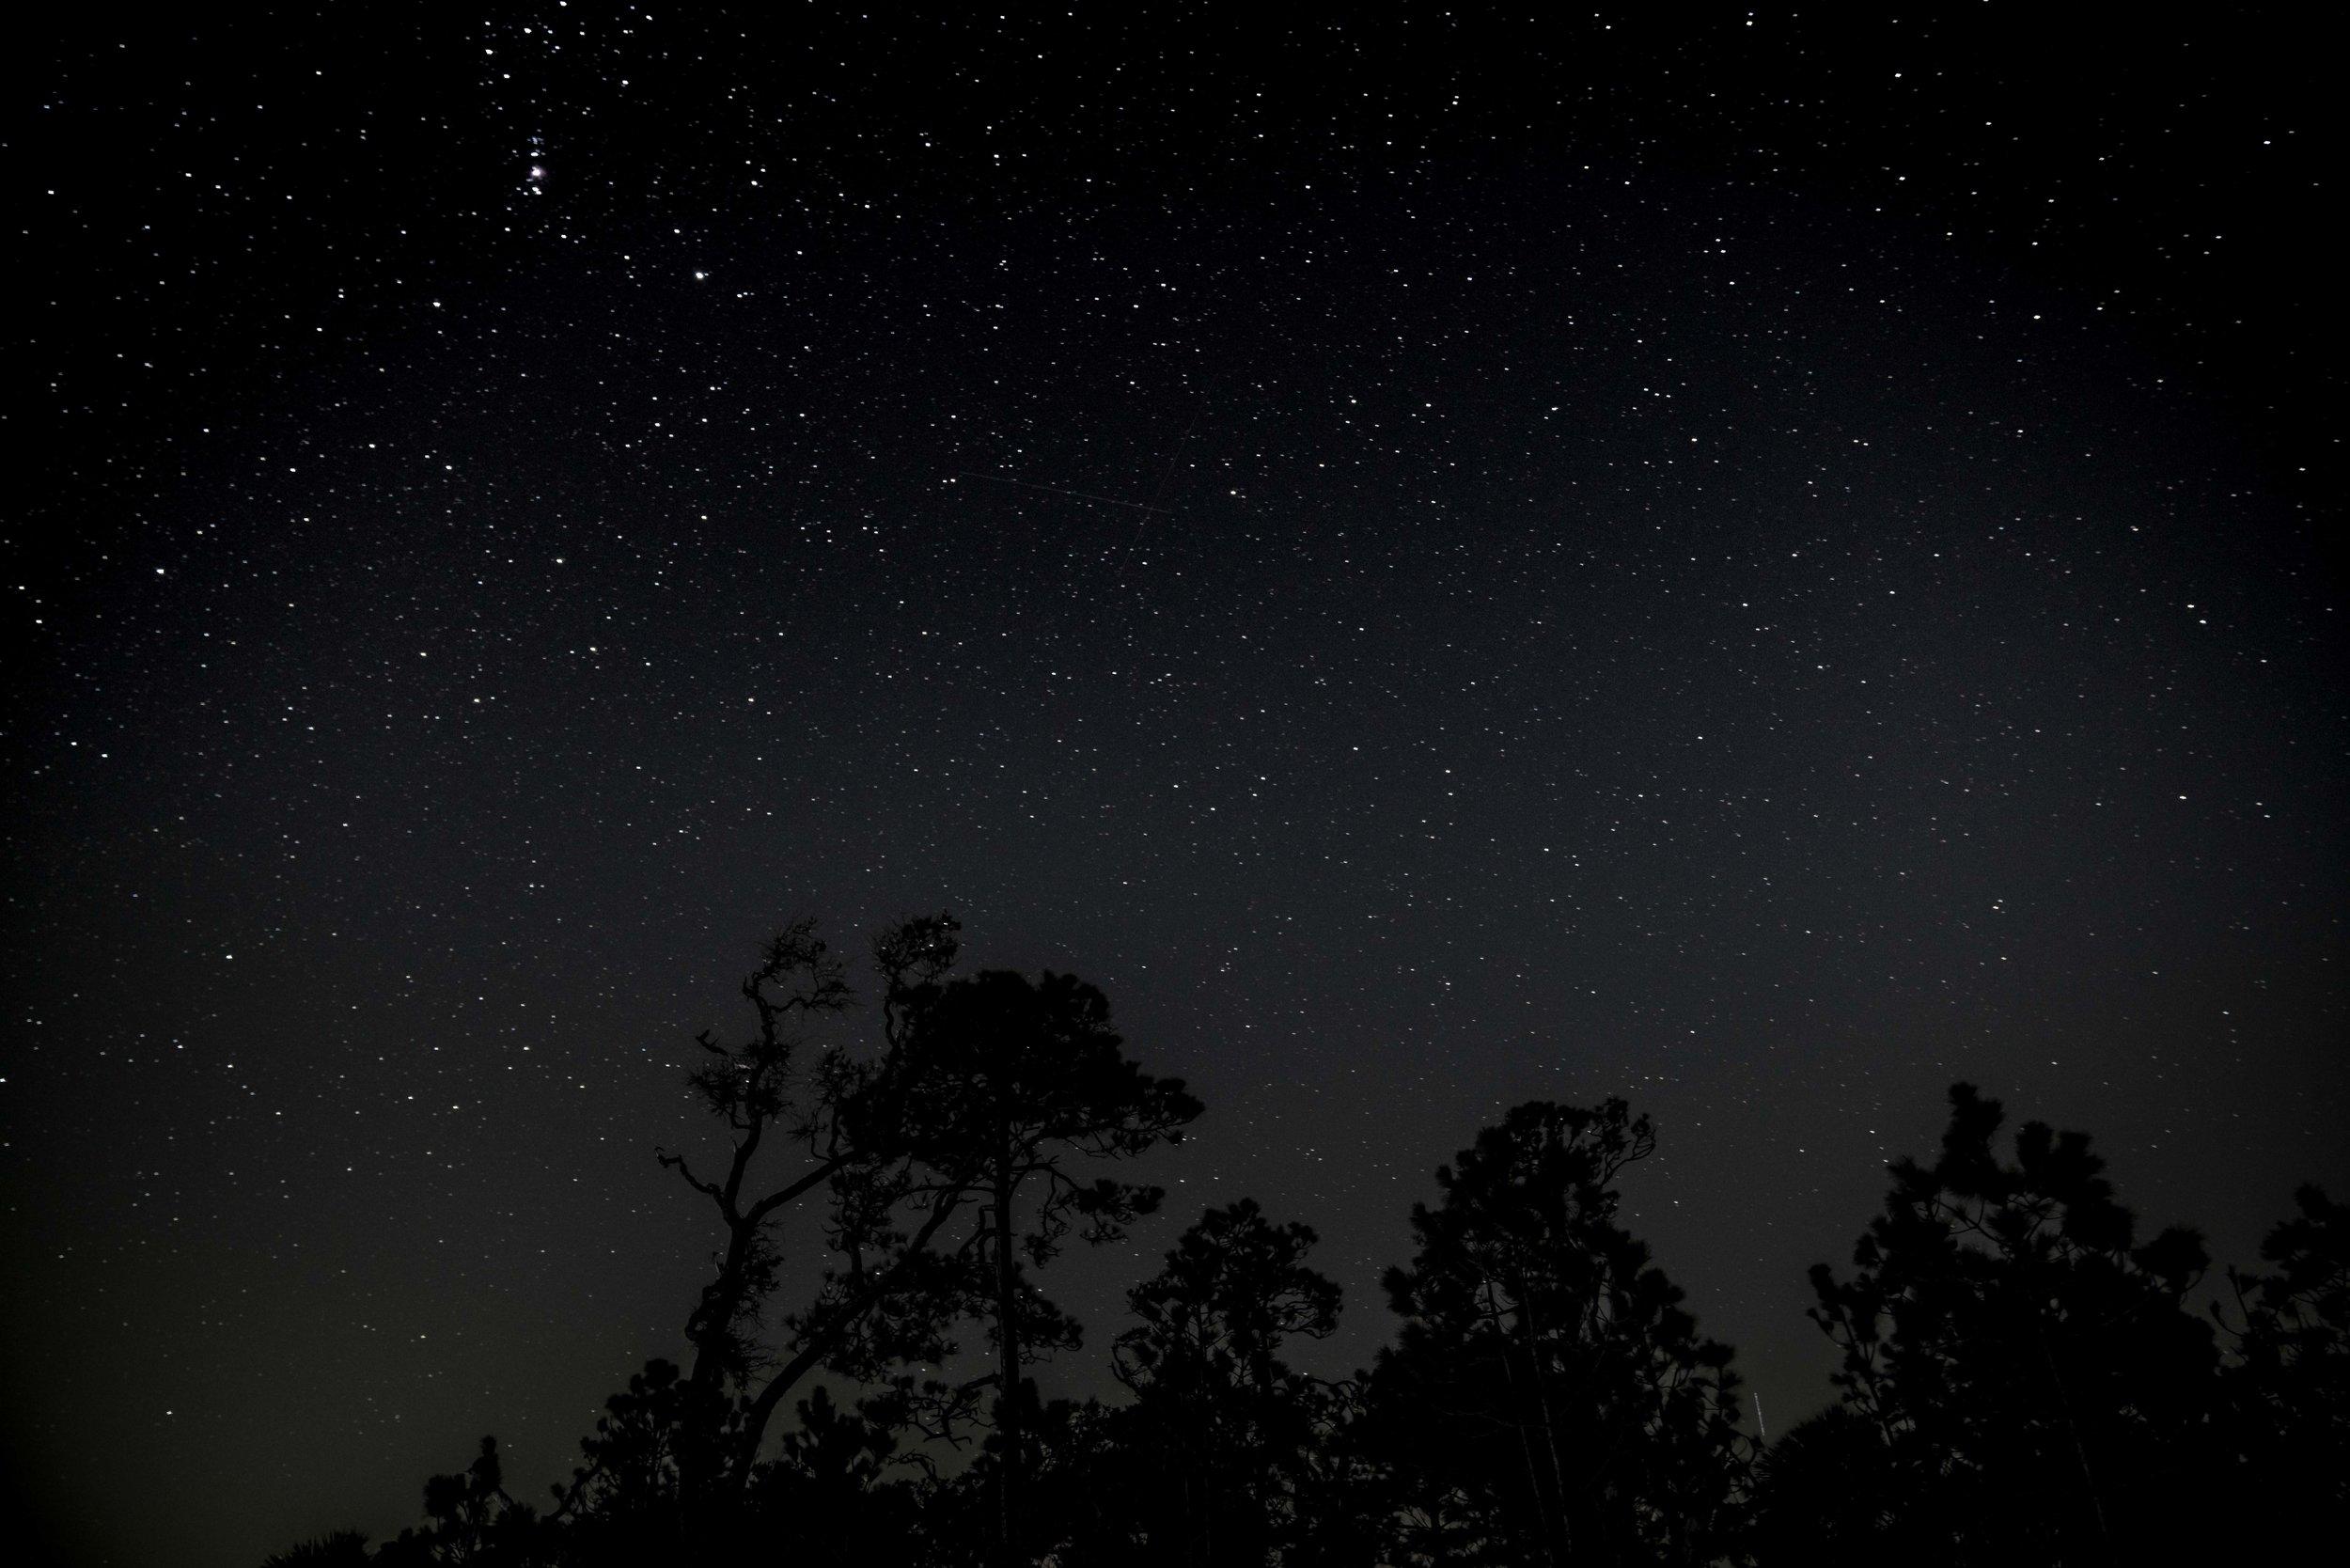 Stars over Little Tybee Island via micahdeyoung.com